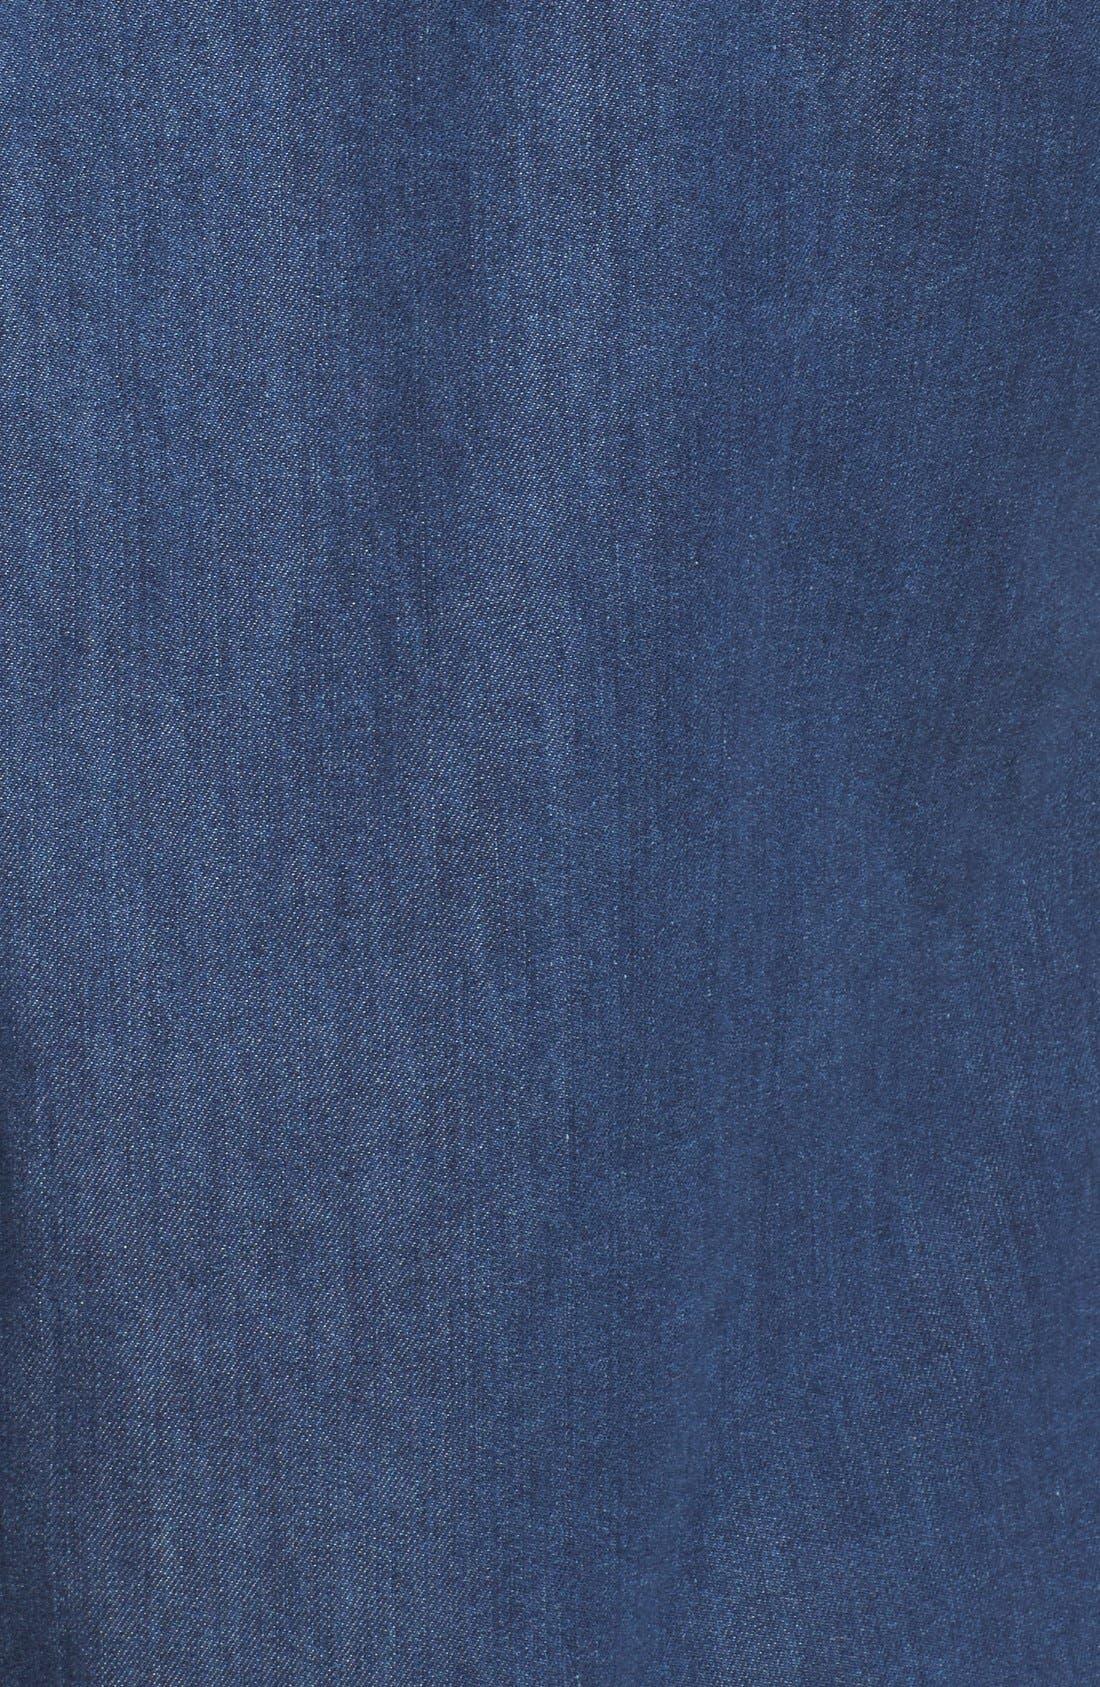 Trim Fit Washed Denim Western Shirt,                             Alternate thumbnail 5, color,                             Blue